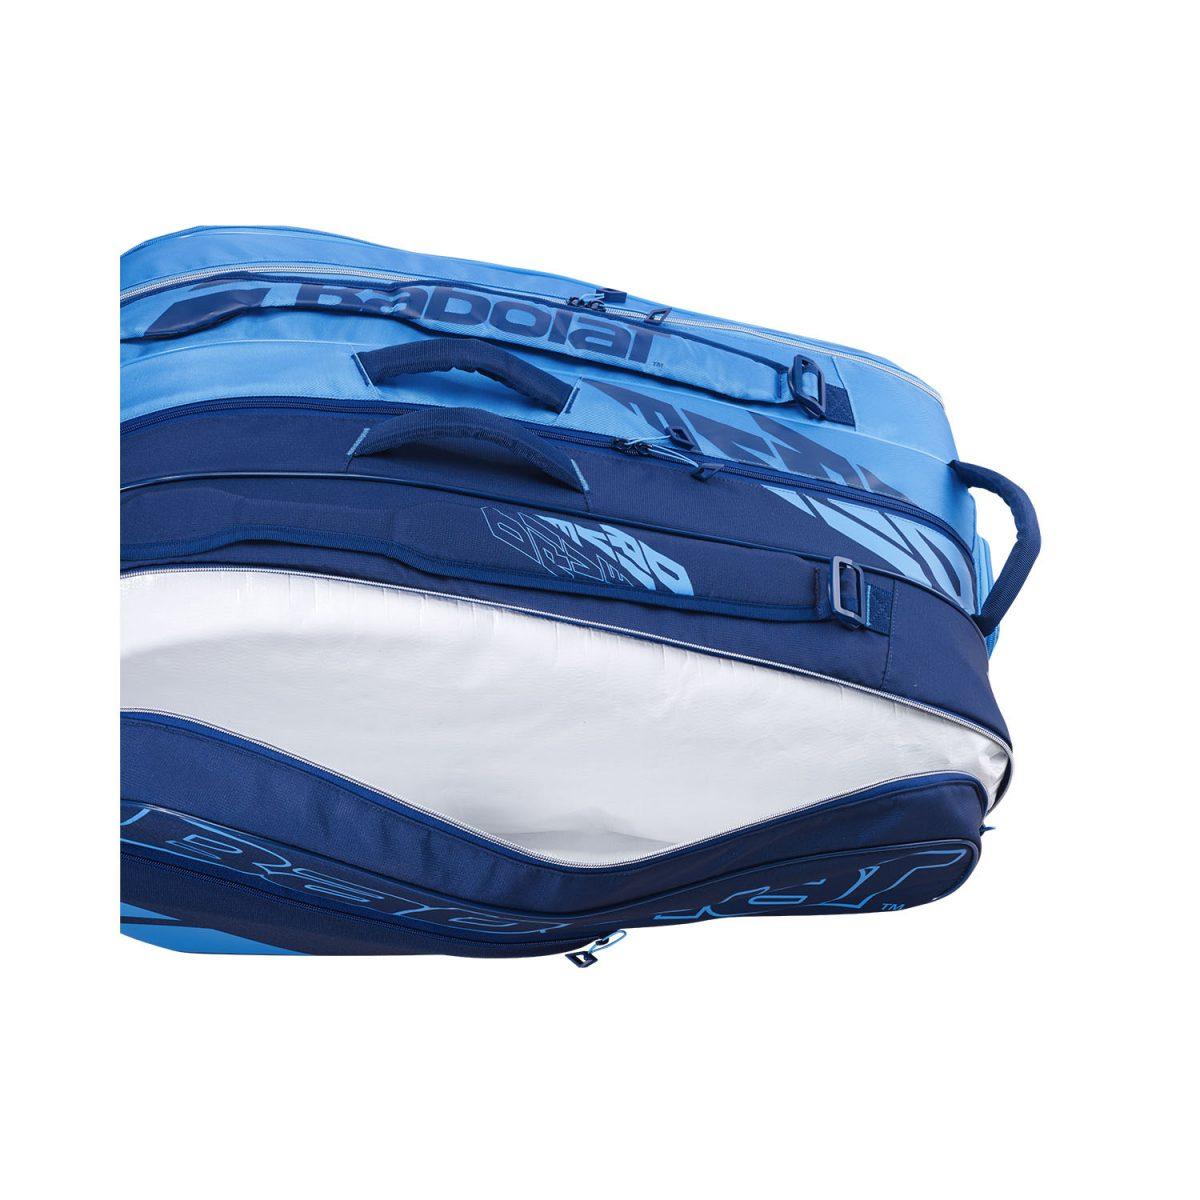 Raqueteira Babolat RH X12 Pure Drive 2021